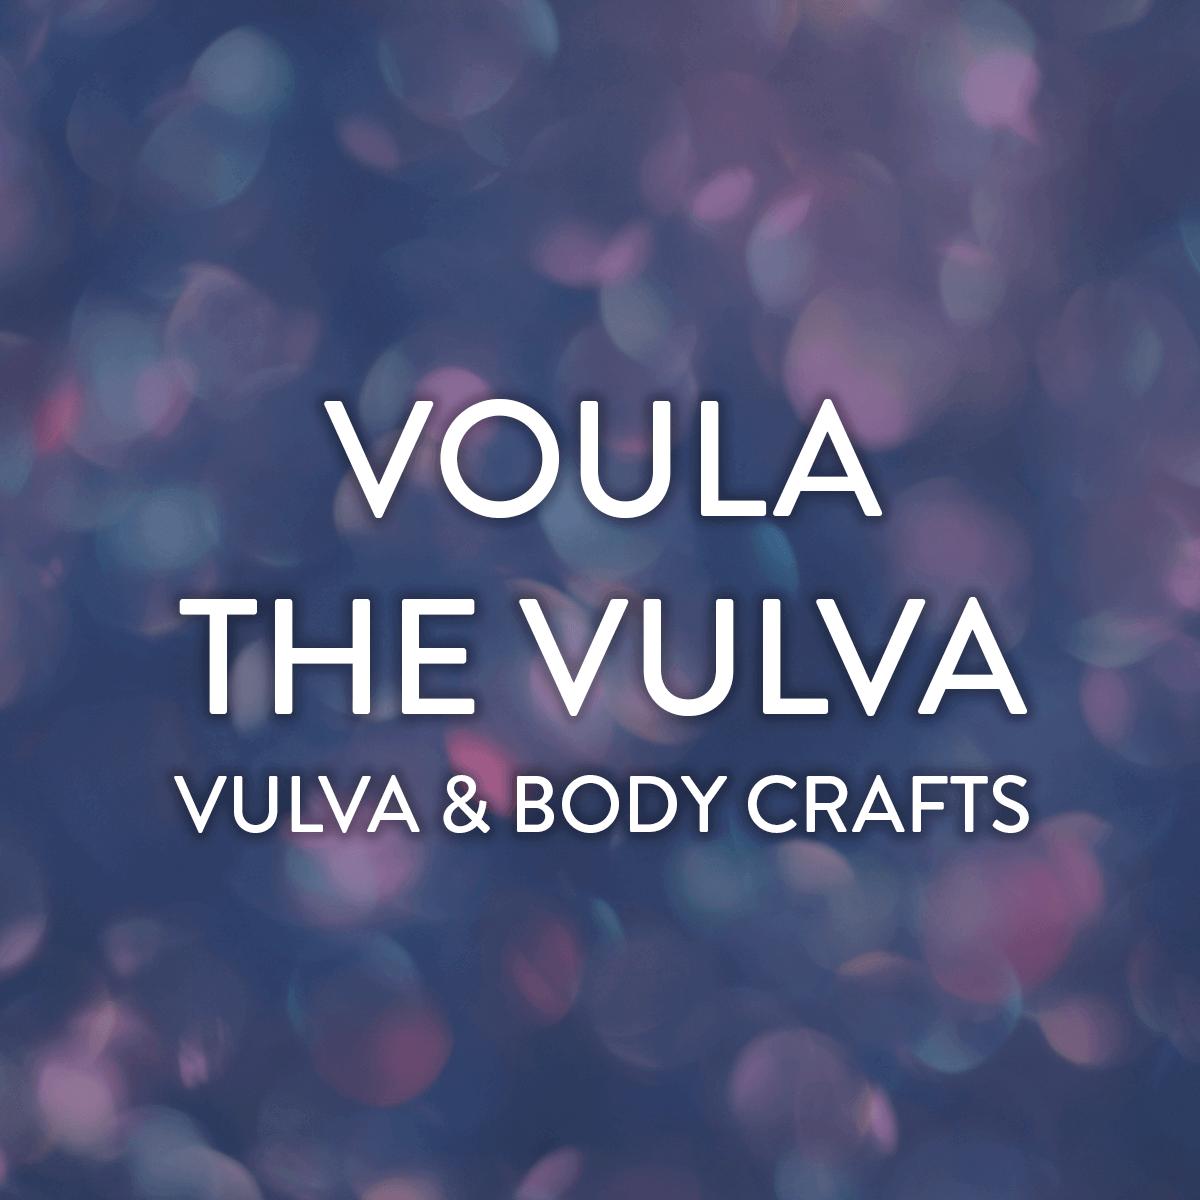 Voula the Vulva